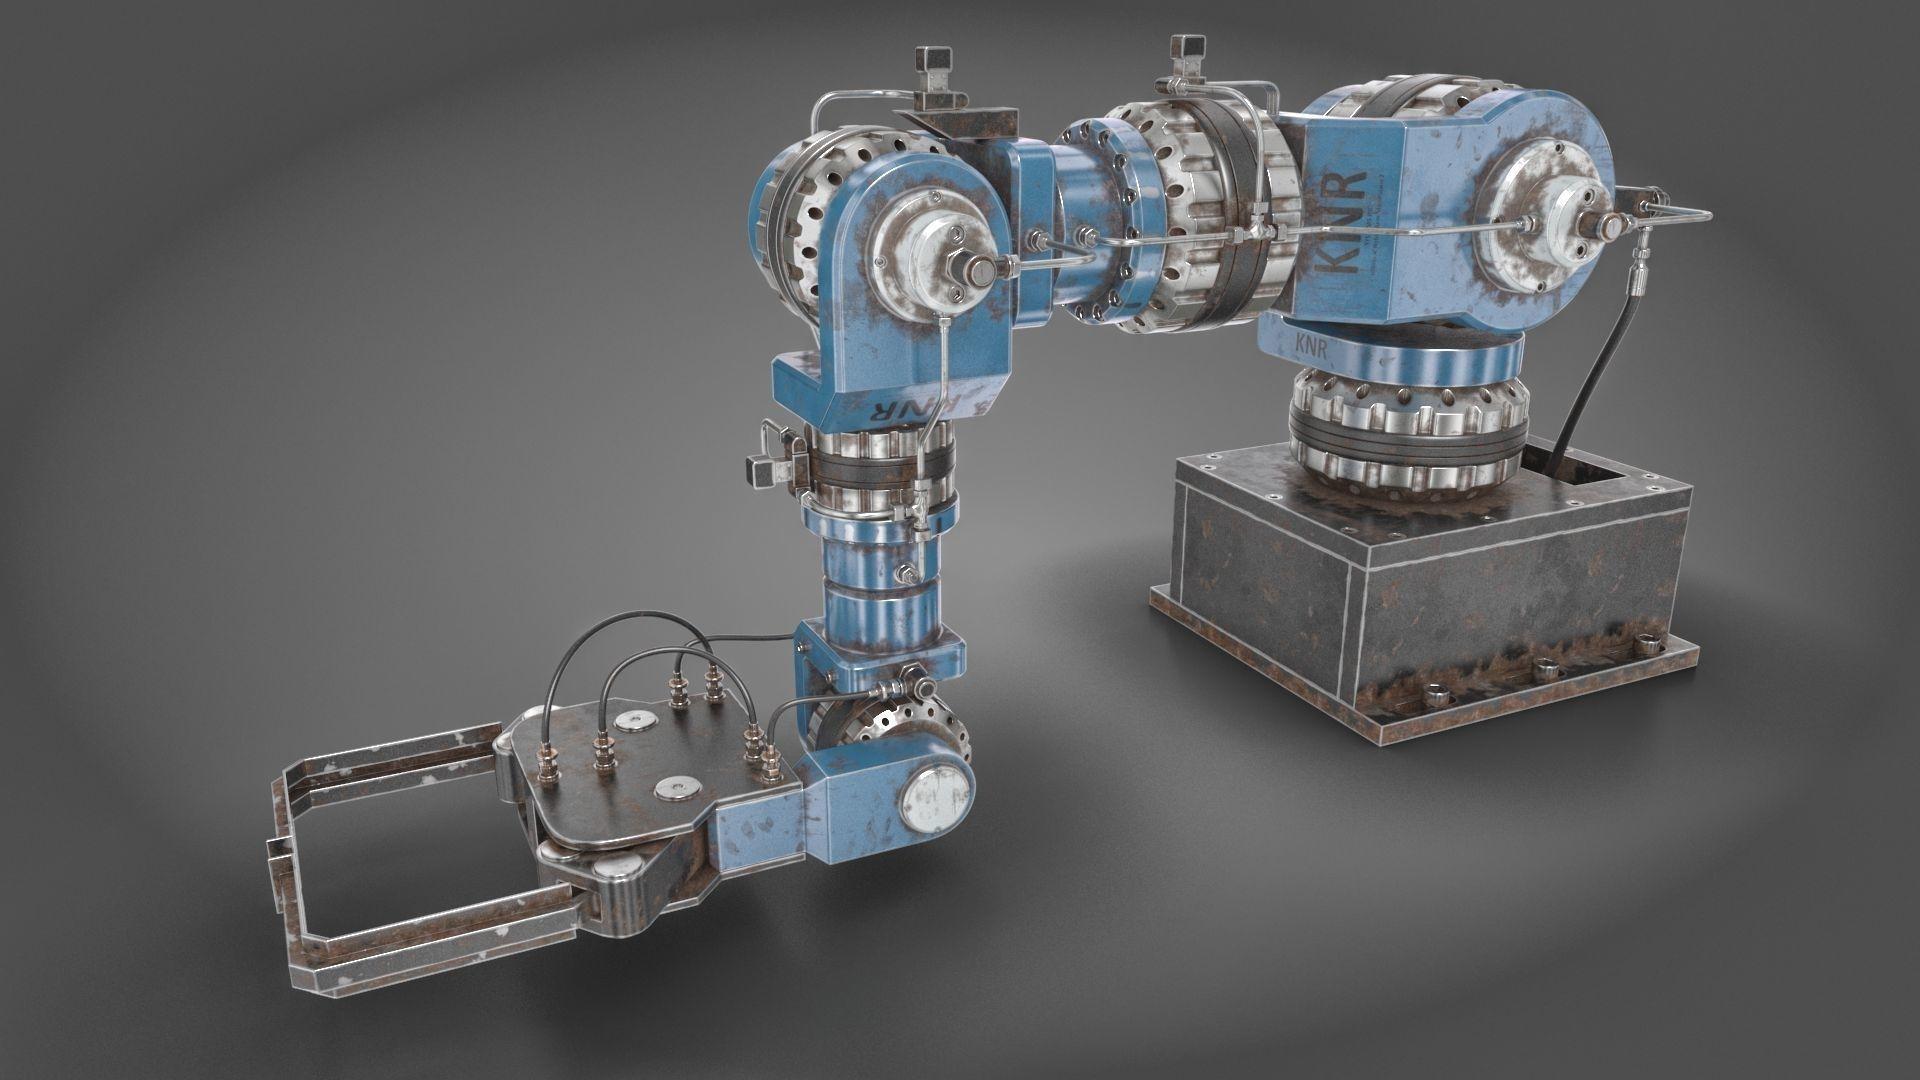 Hydra Mp Robotic Arm Manipulator